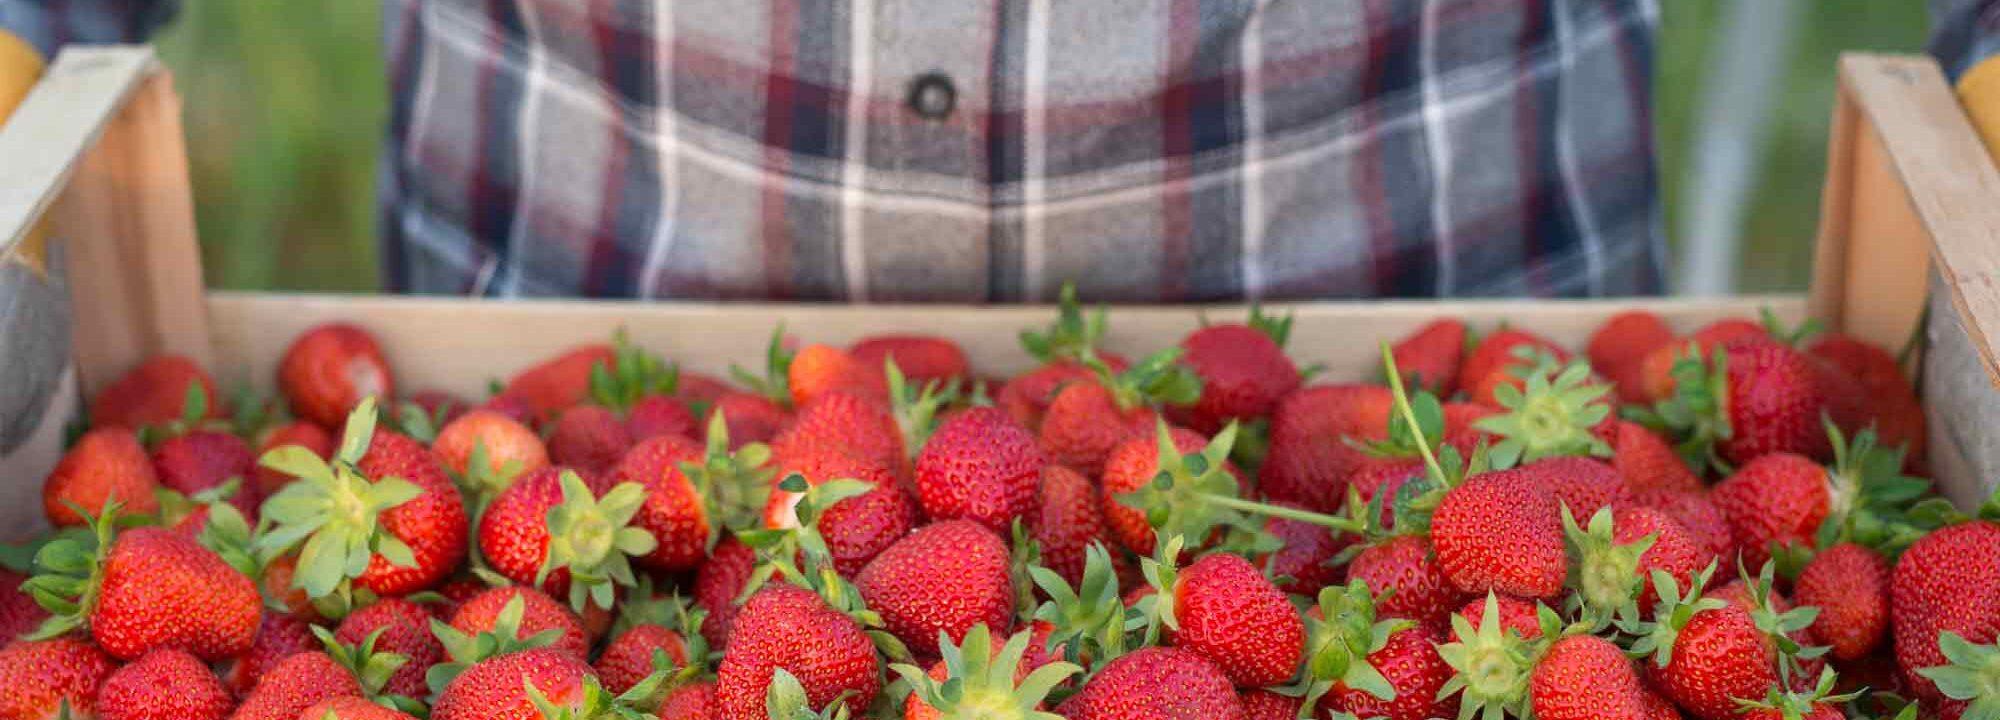 Wye Valley Food Festival Stawberries